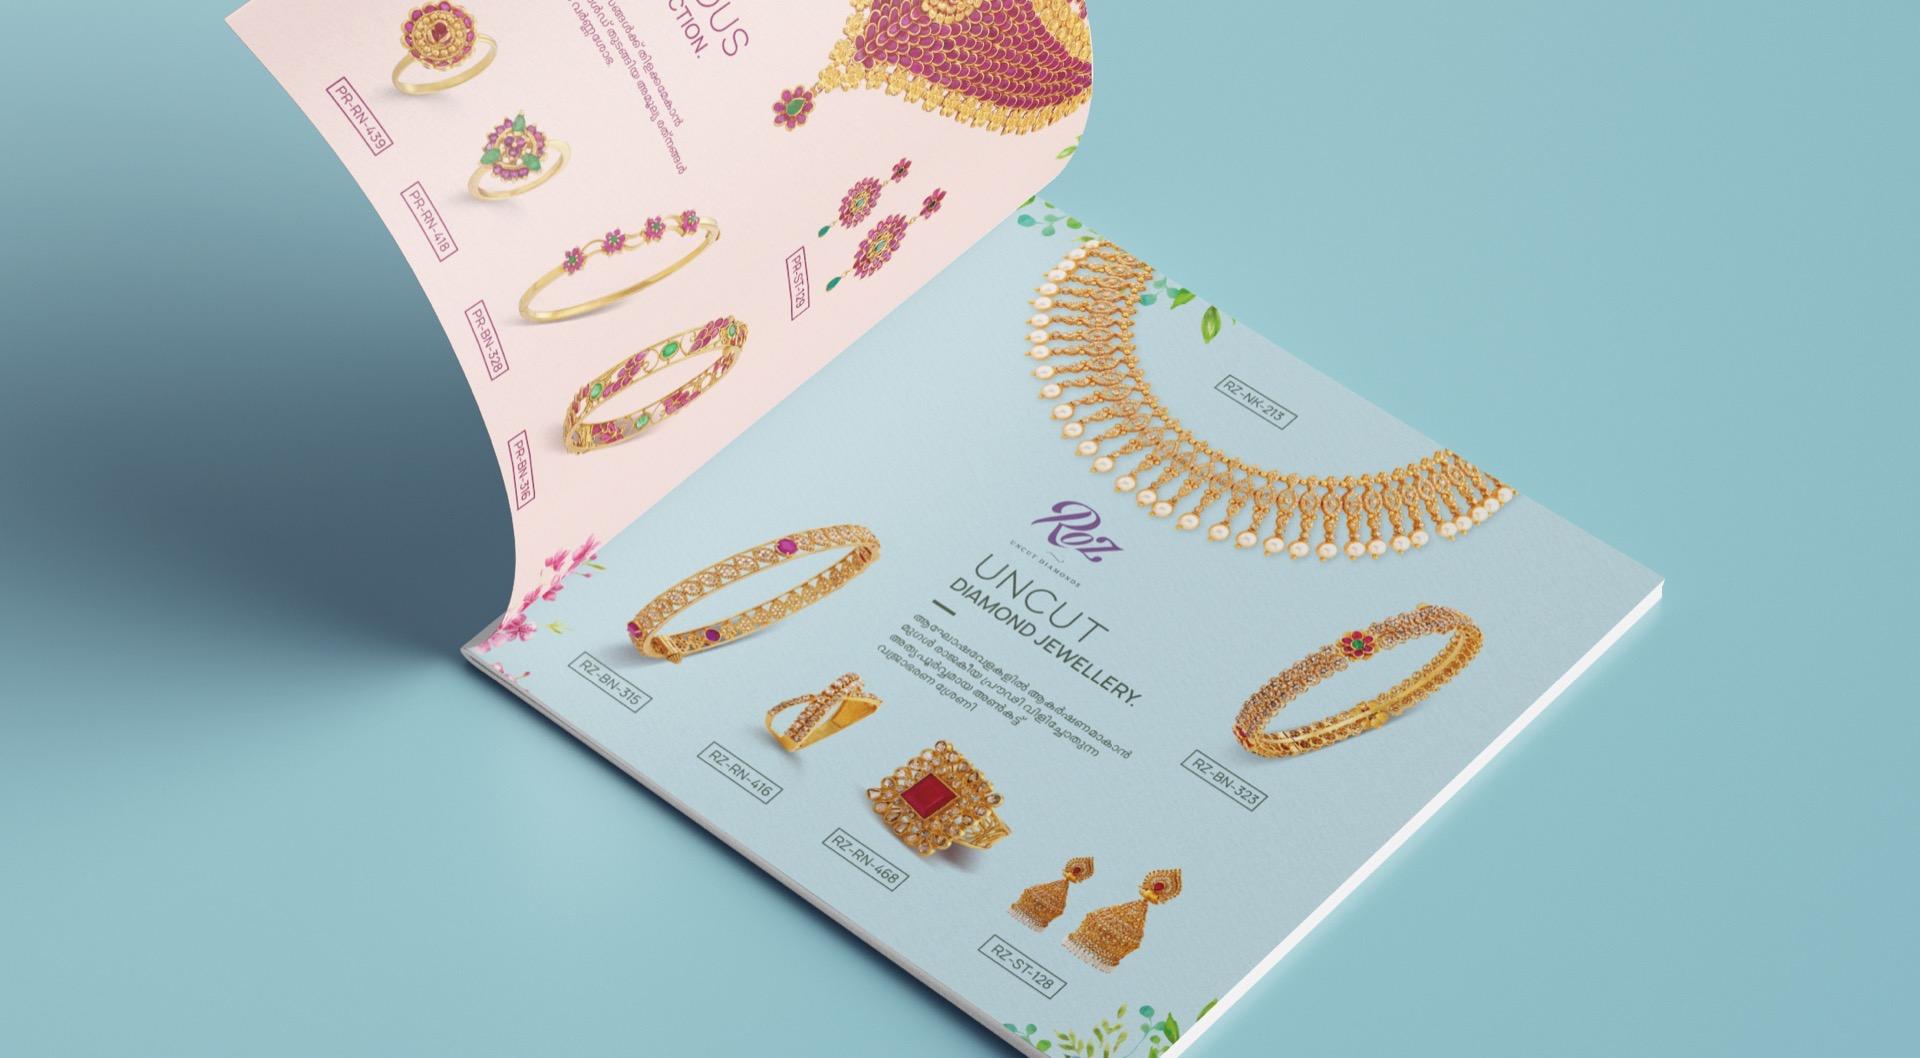 Brochure deisgn for Aksya Gold & Diamonds featuring Actress Vidya Balan